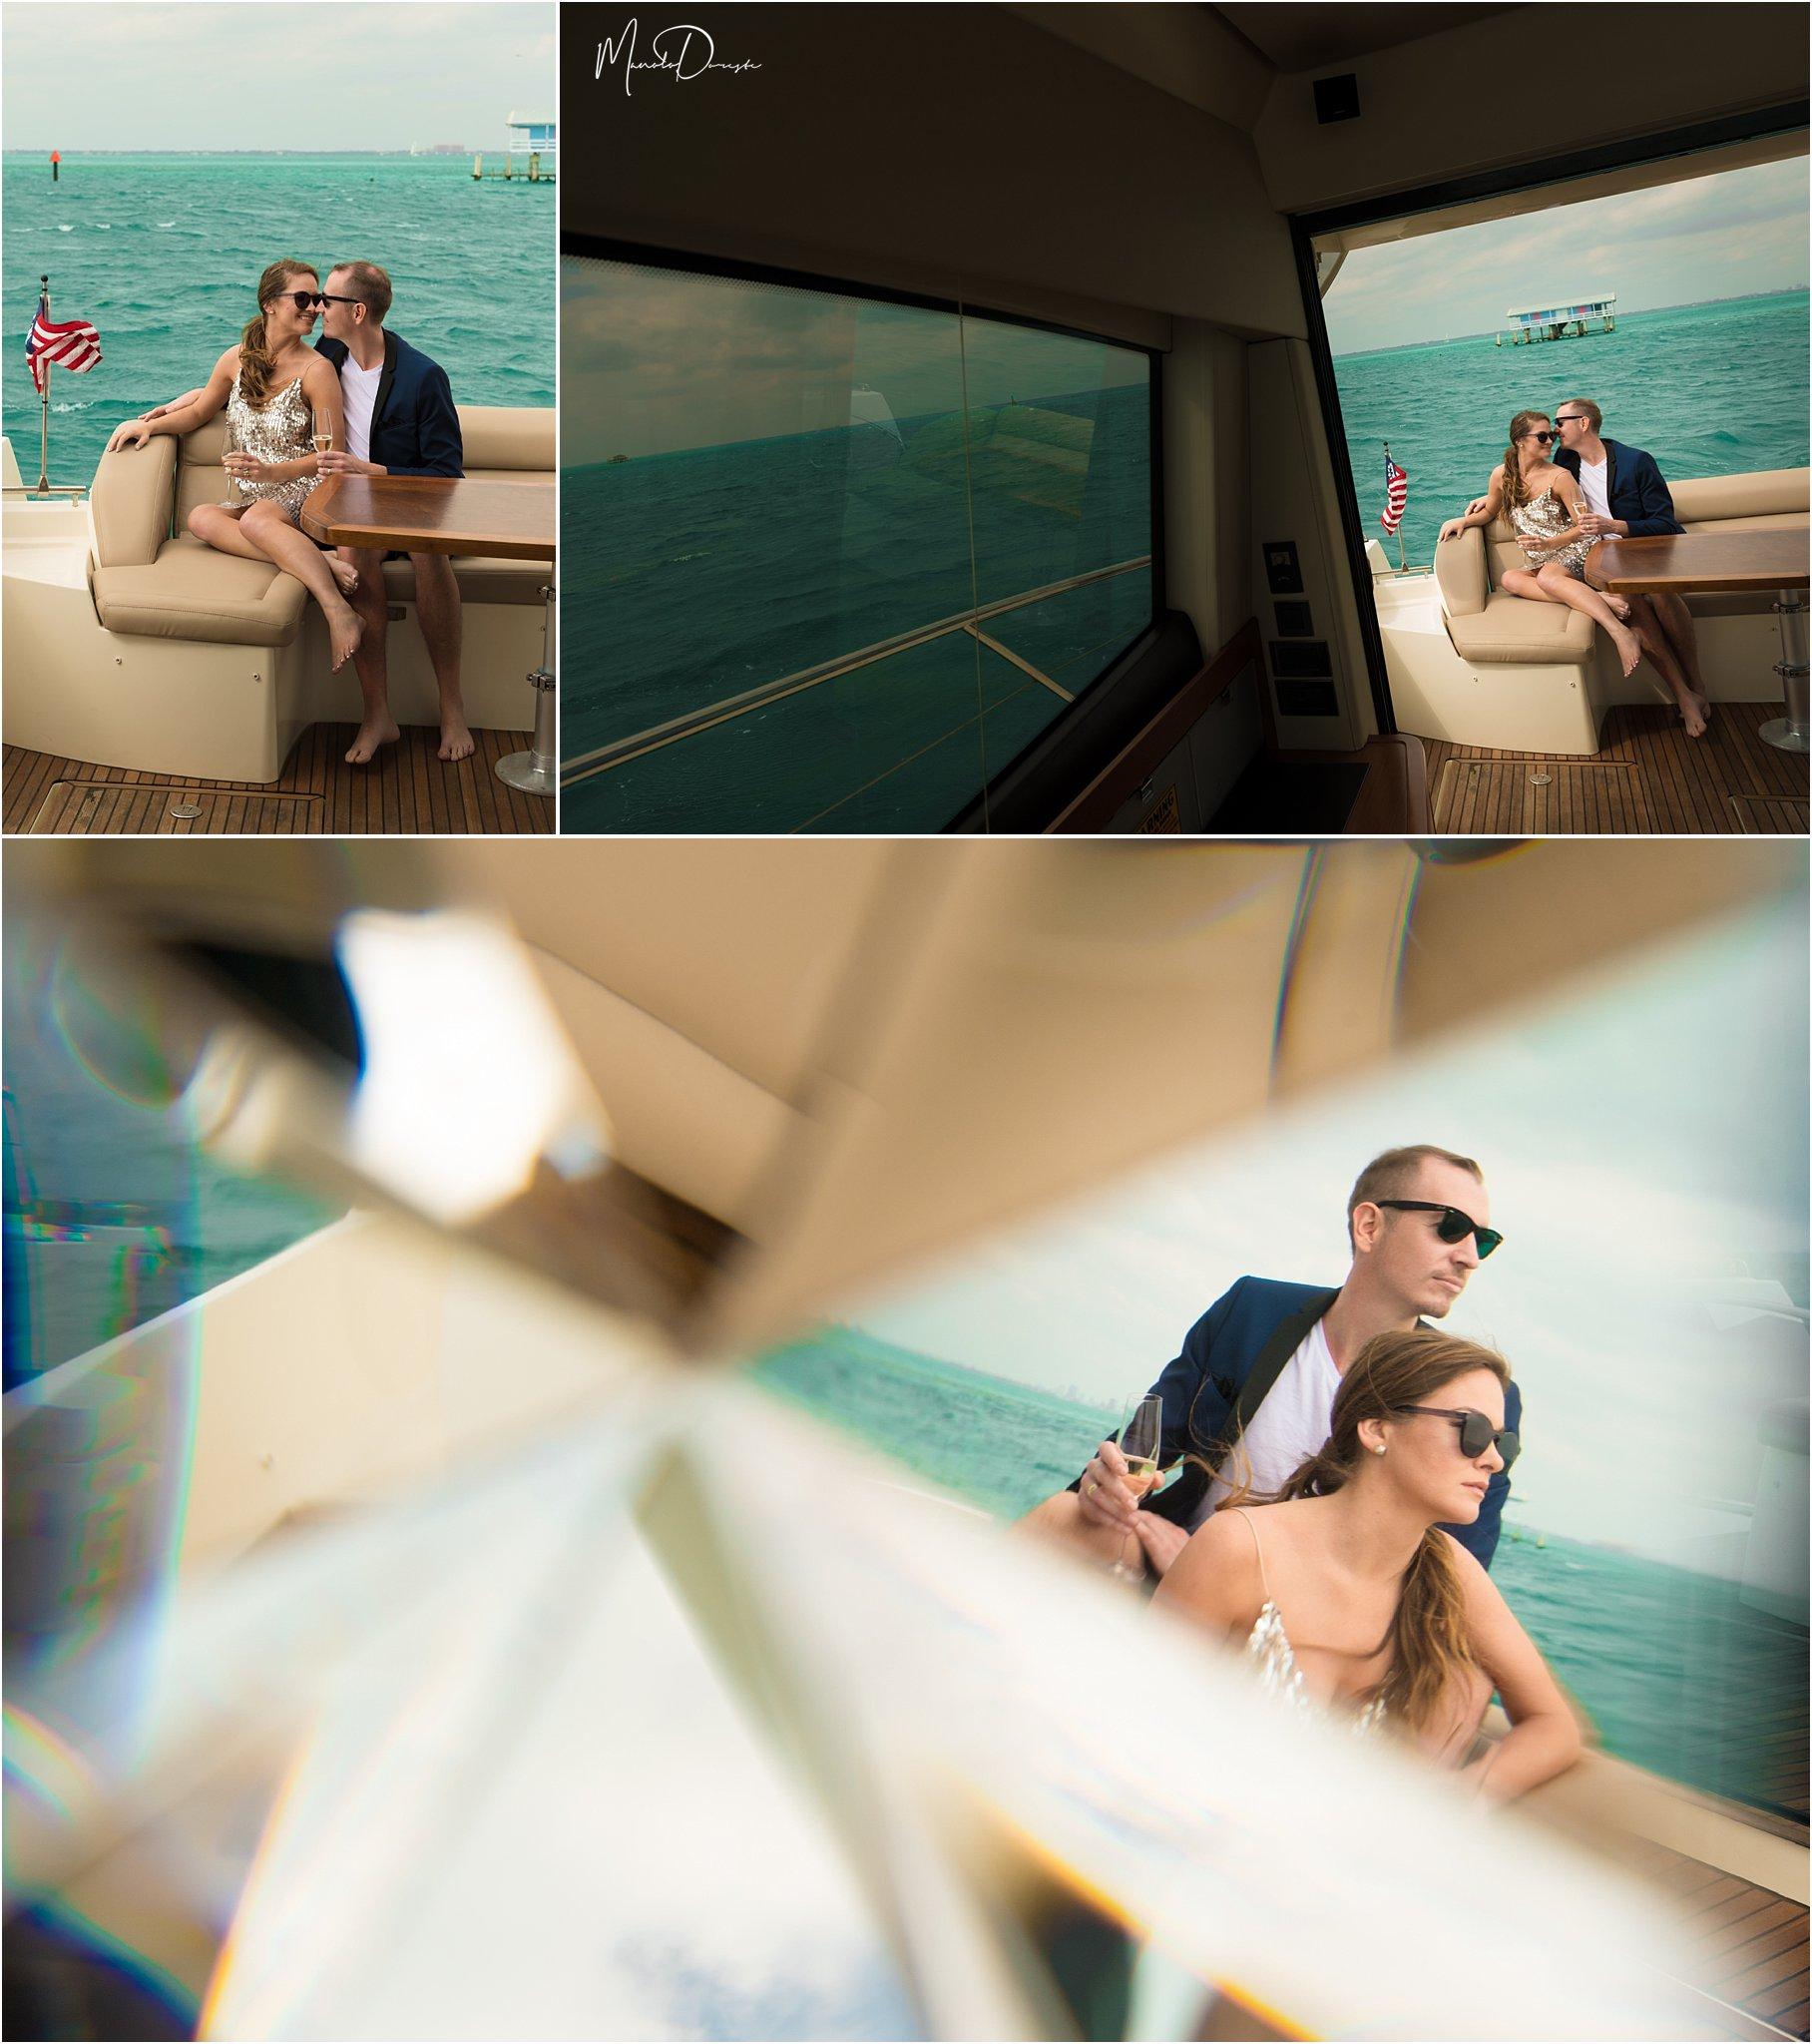 00902_ManoloDoreste_InFocusStudios_Wedding_Family_Photography_Miami_MiamiPhotographer.jpg